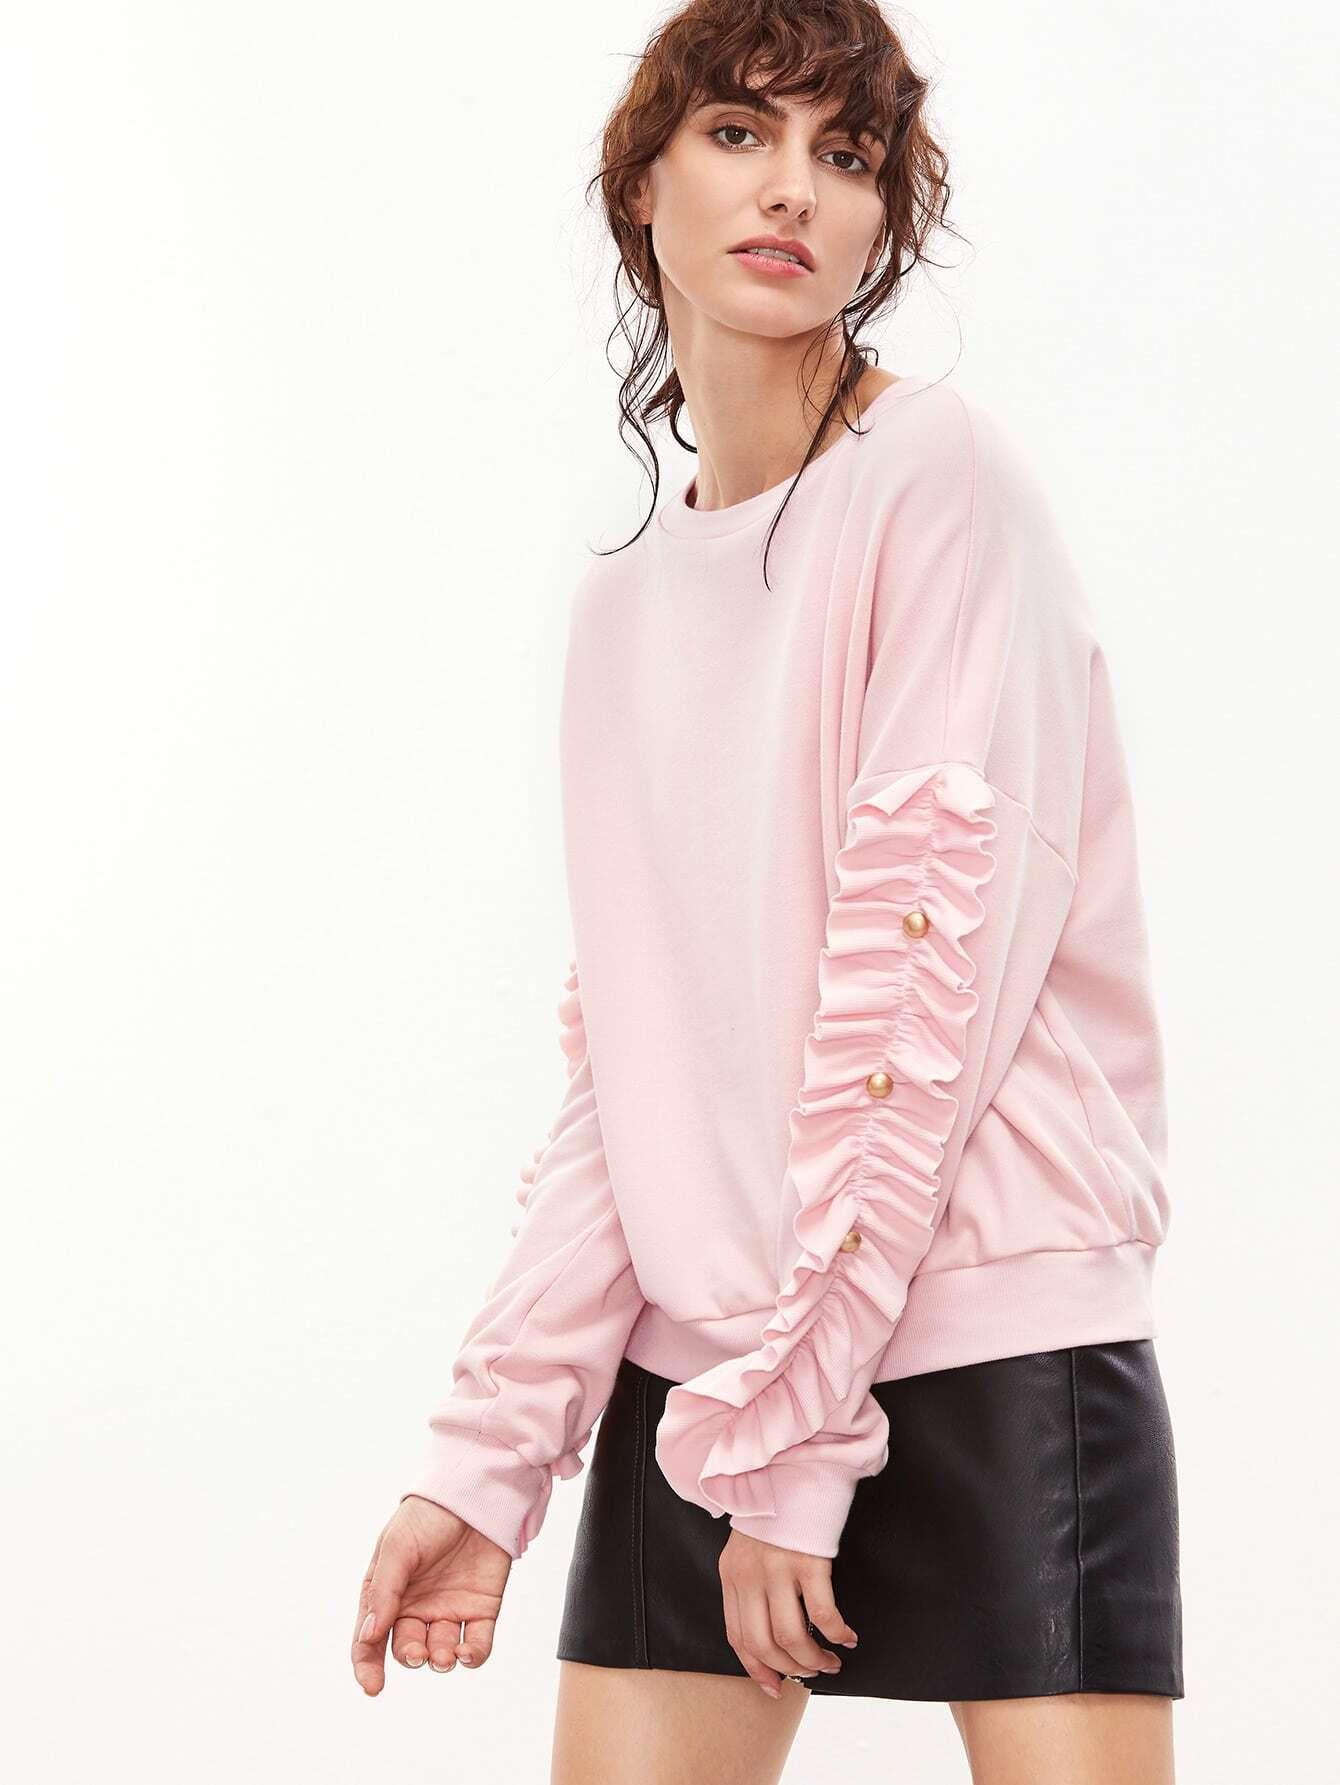 Pink Drop Shoulder Frill Trim Sleeve Sweatshirt sweatshirt161201701